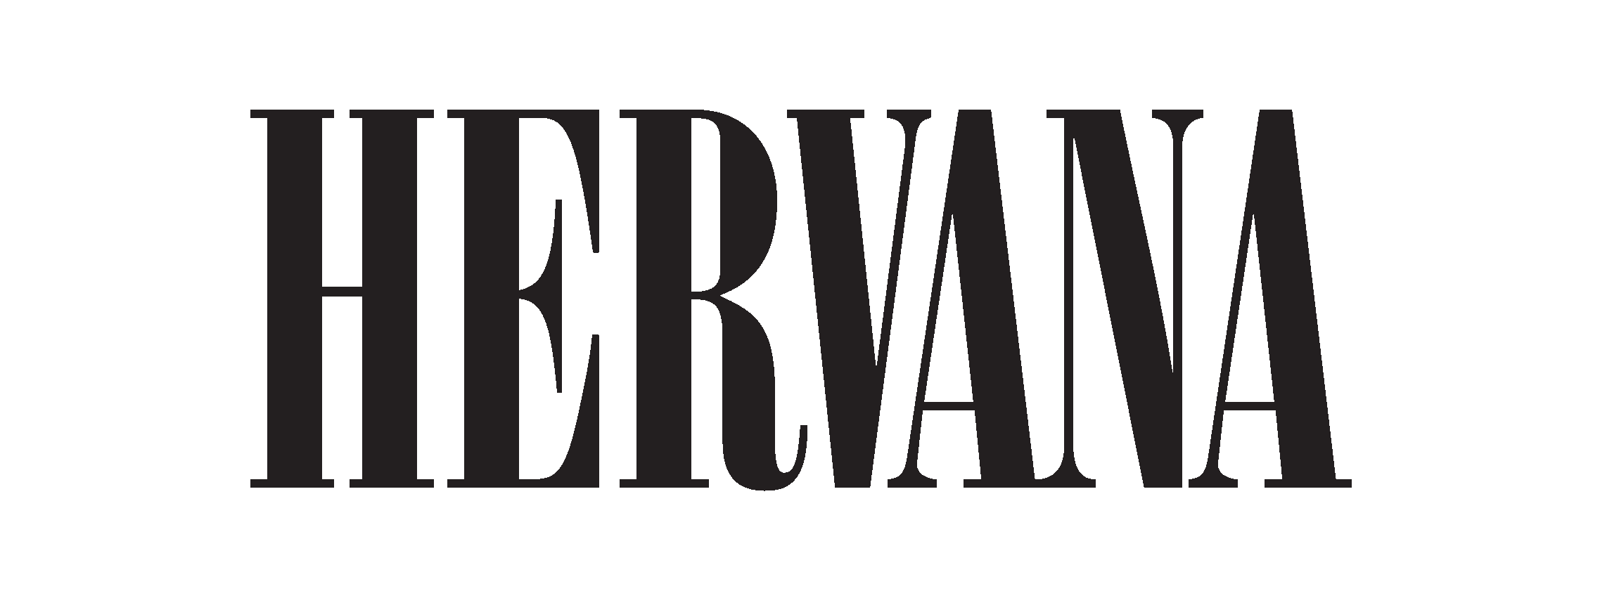 Hervana